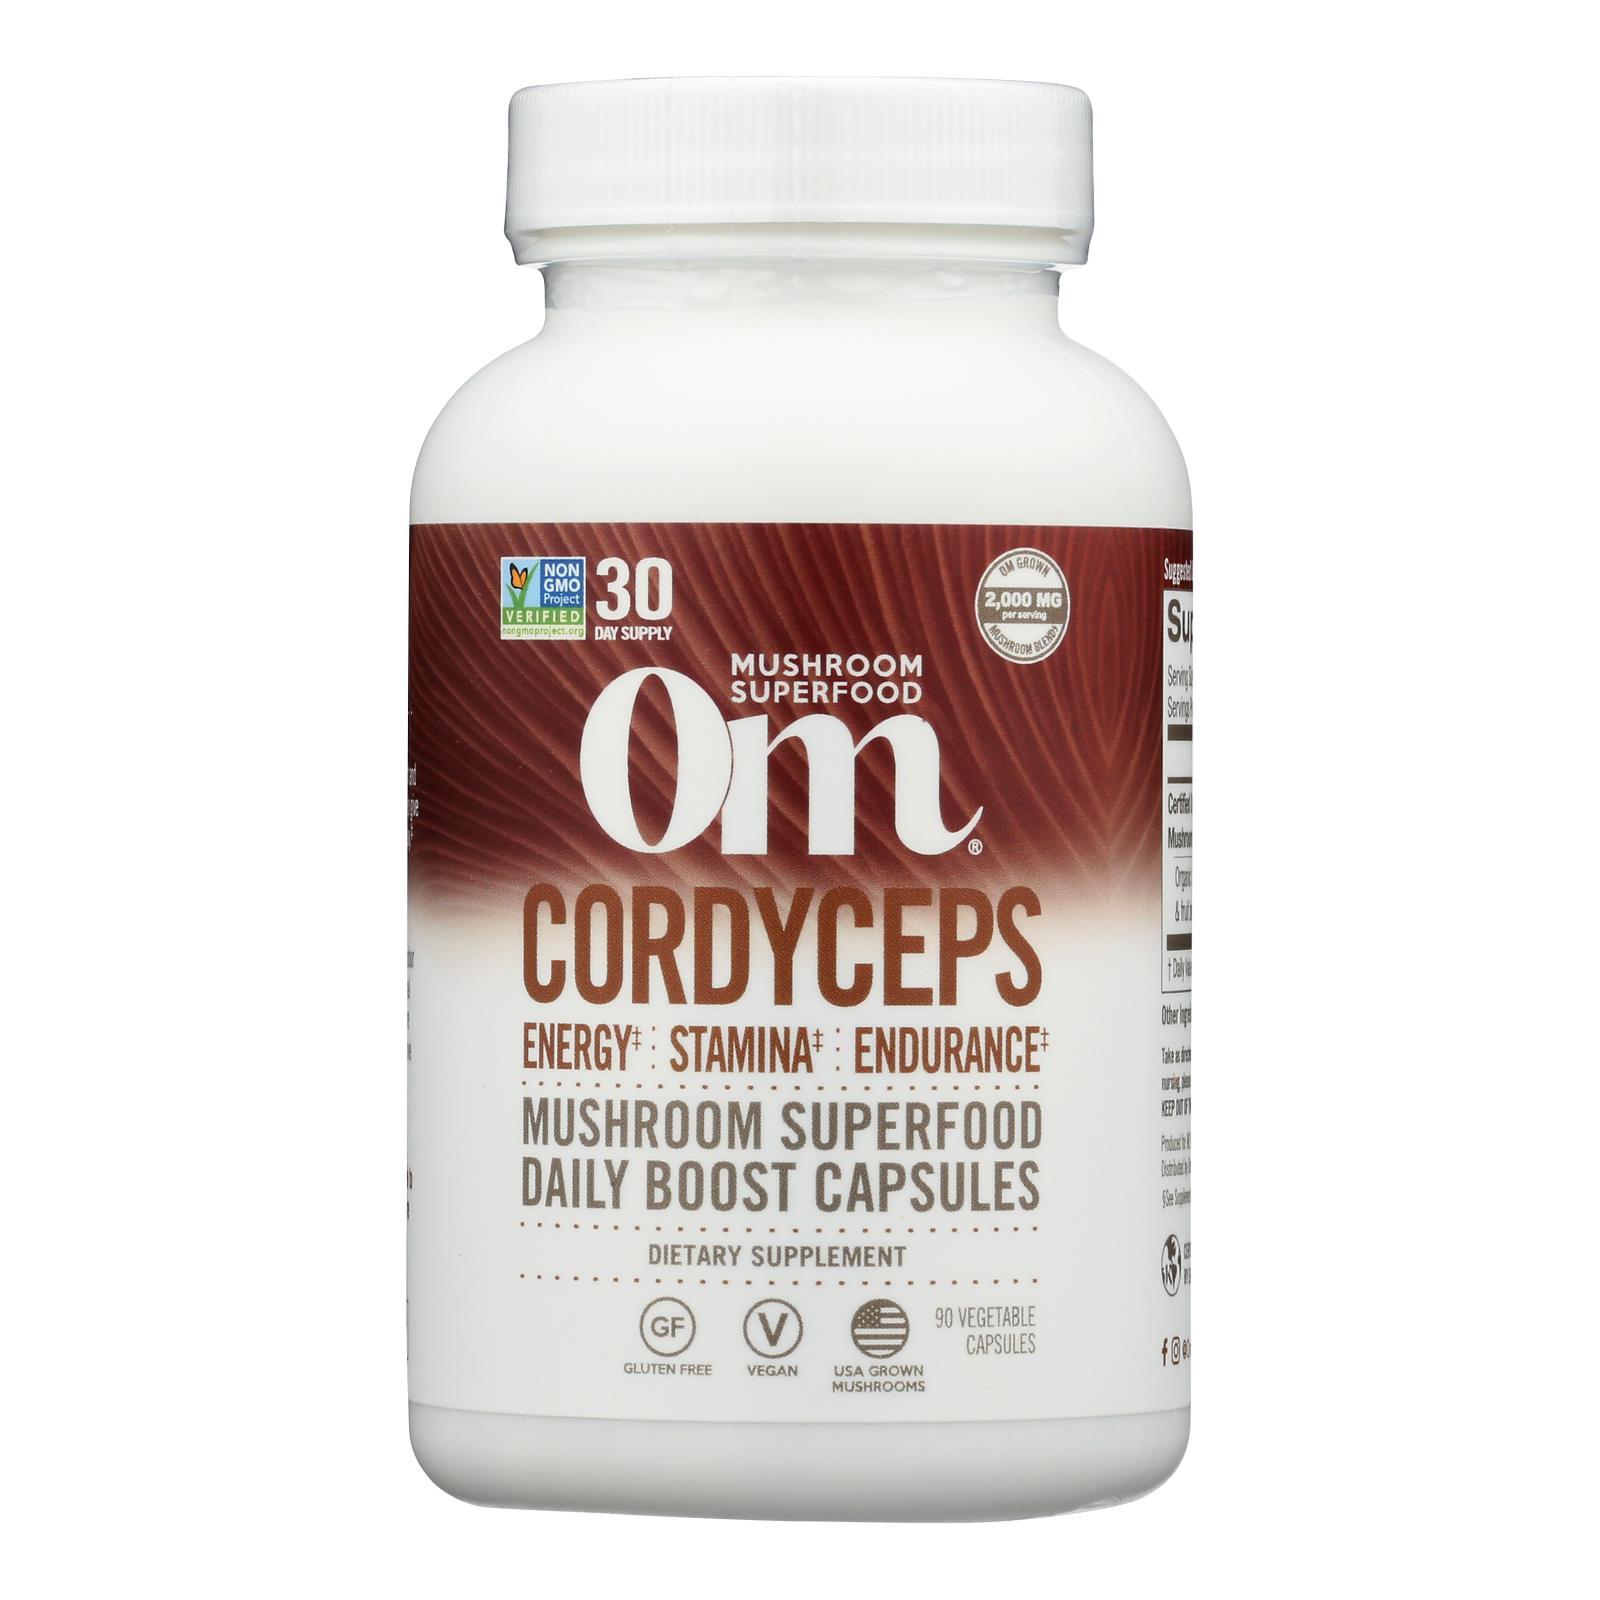 Organic Mushroom Nutrition - Mush Sprfd Crdycpts Caps - 1 Each - 90 CT